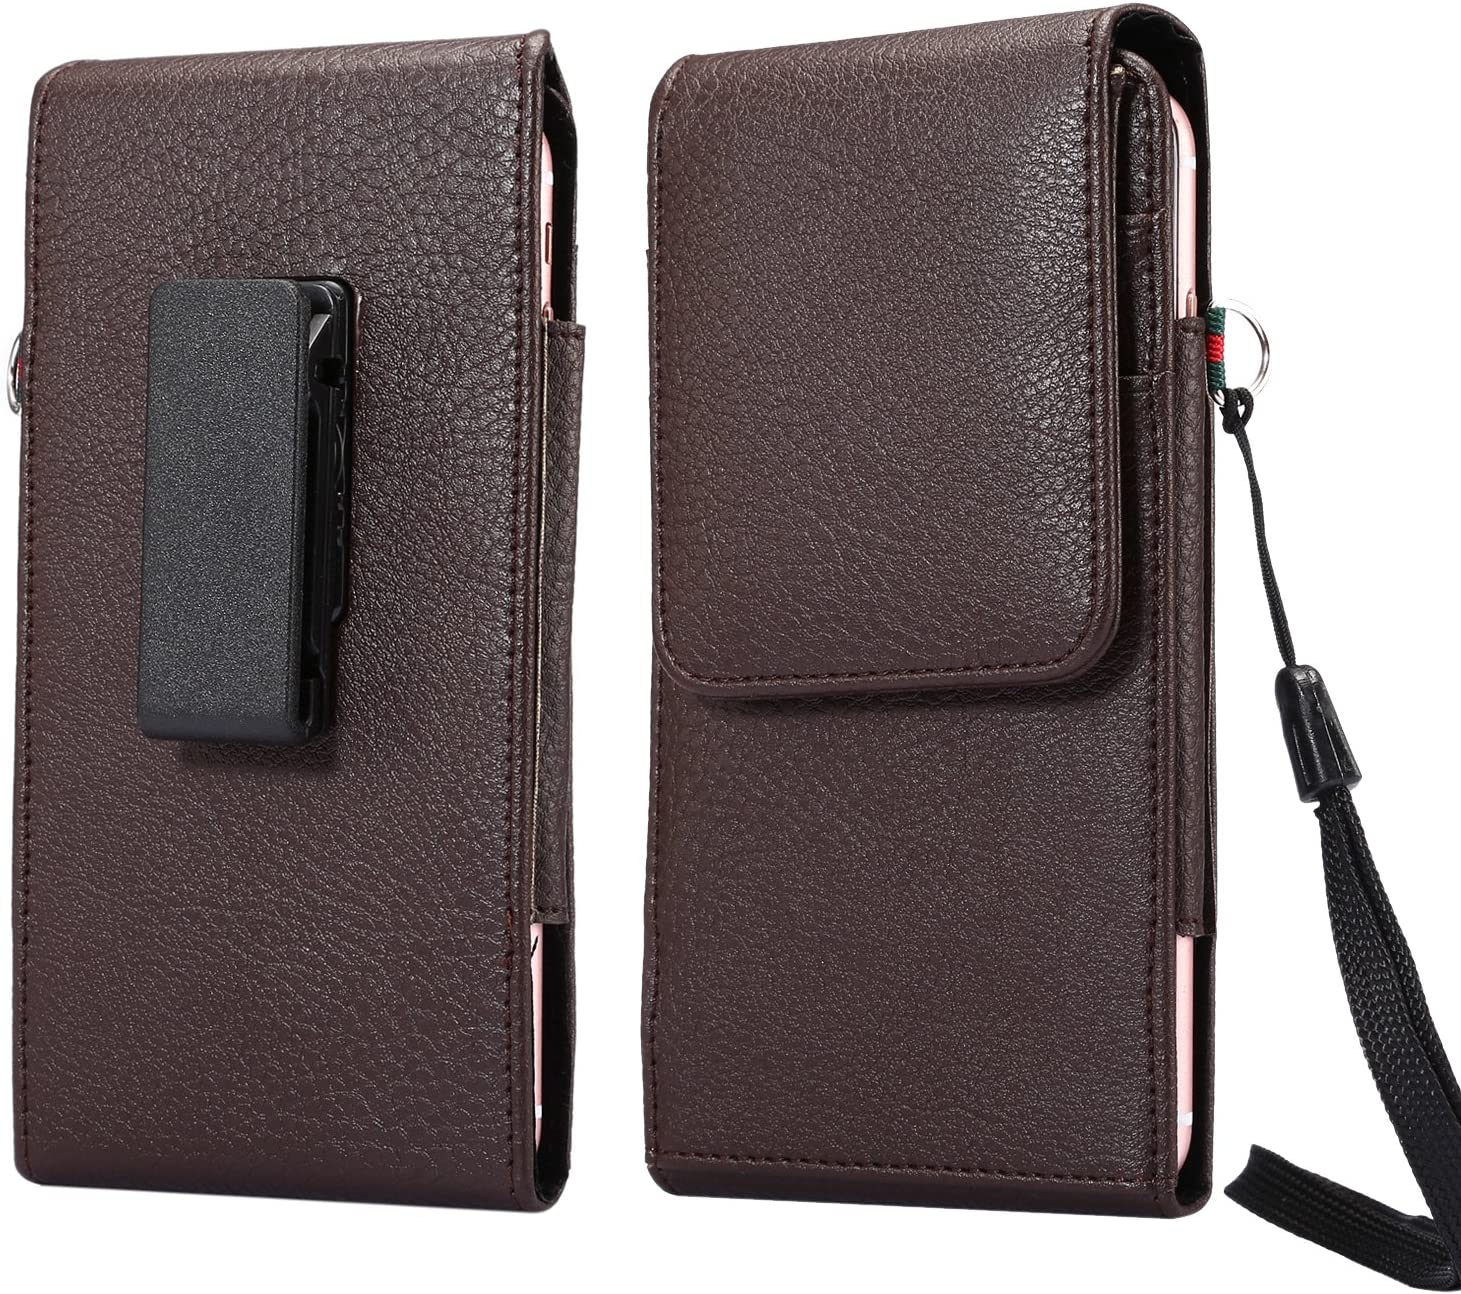 Workout Faux Leather Card Holder Swivel Belt Clip Holster for Samsung Galaxy Note 10+ Plus / A10 / A20 / A50 / LG Stylo 5 / Motorola Moto G7 Power/Xiaomi Mi 9T / A2 / Razer Phone 2 / BlU G9 (Brown)